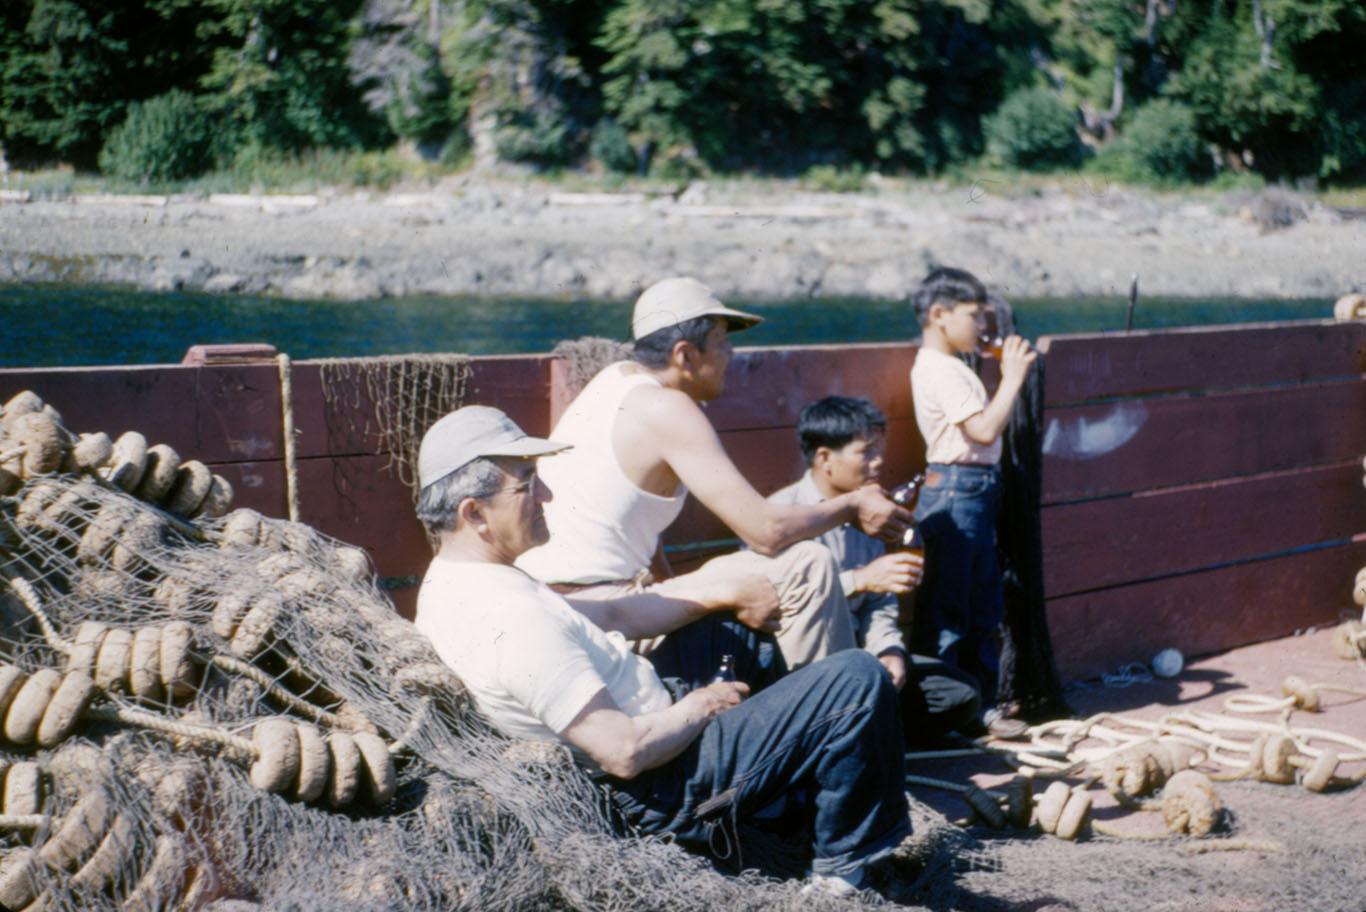 Photo by Cyrus E. Peck shows William L. Paul, Sr., Walter Soboleff, M. Quinto and Ray Peck on a seiner.